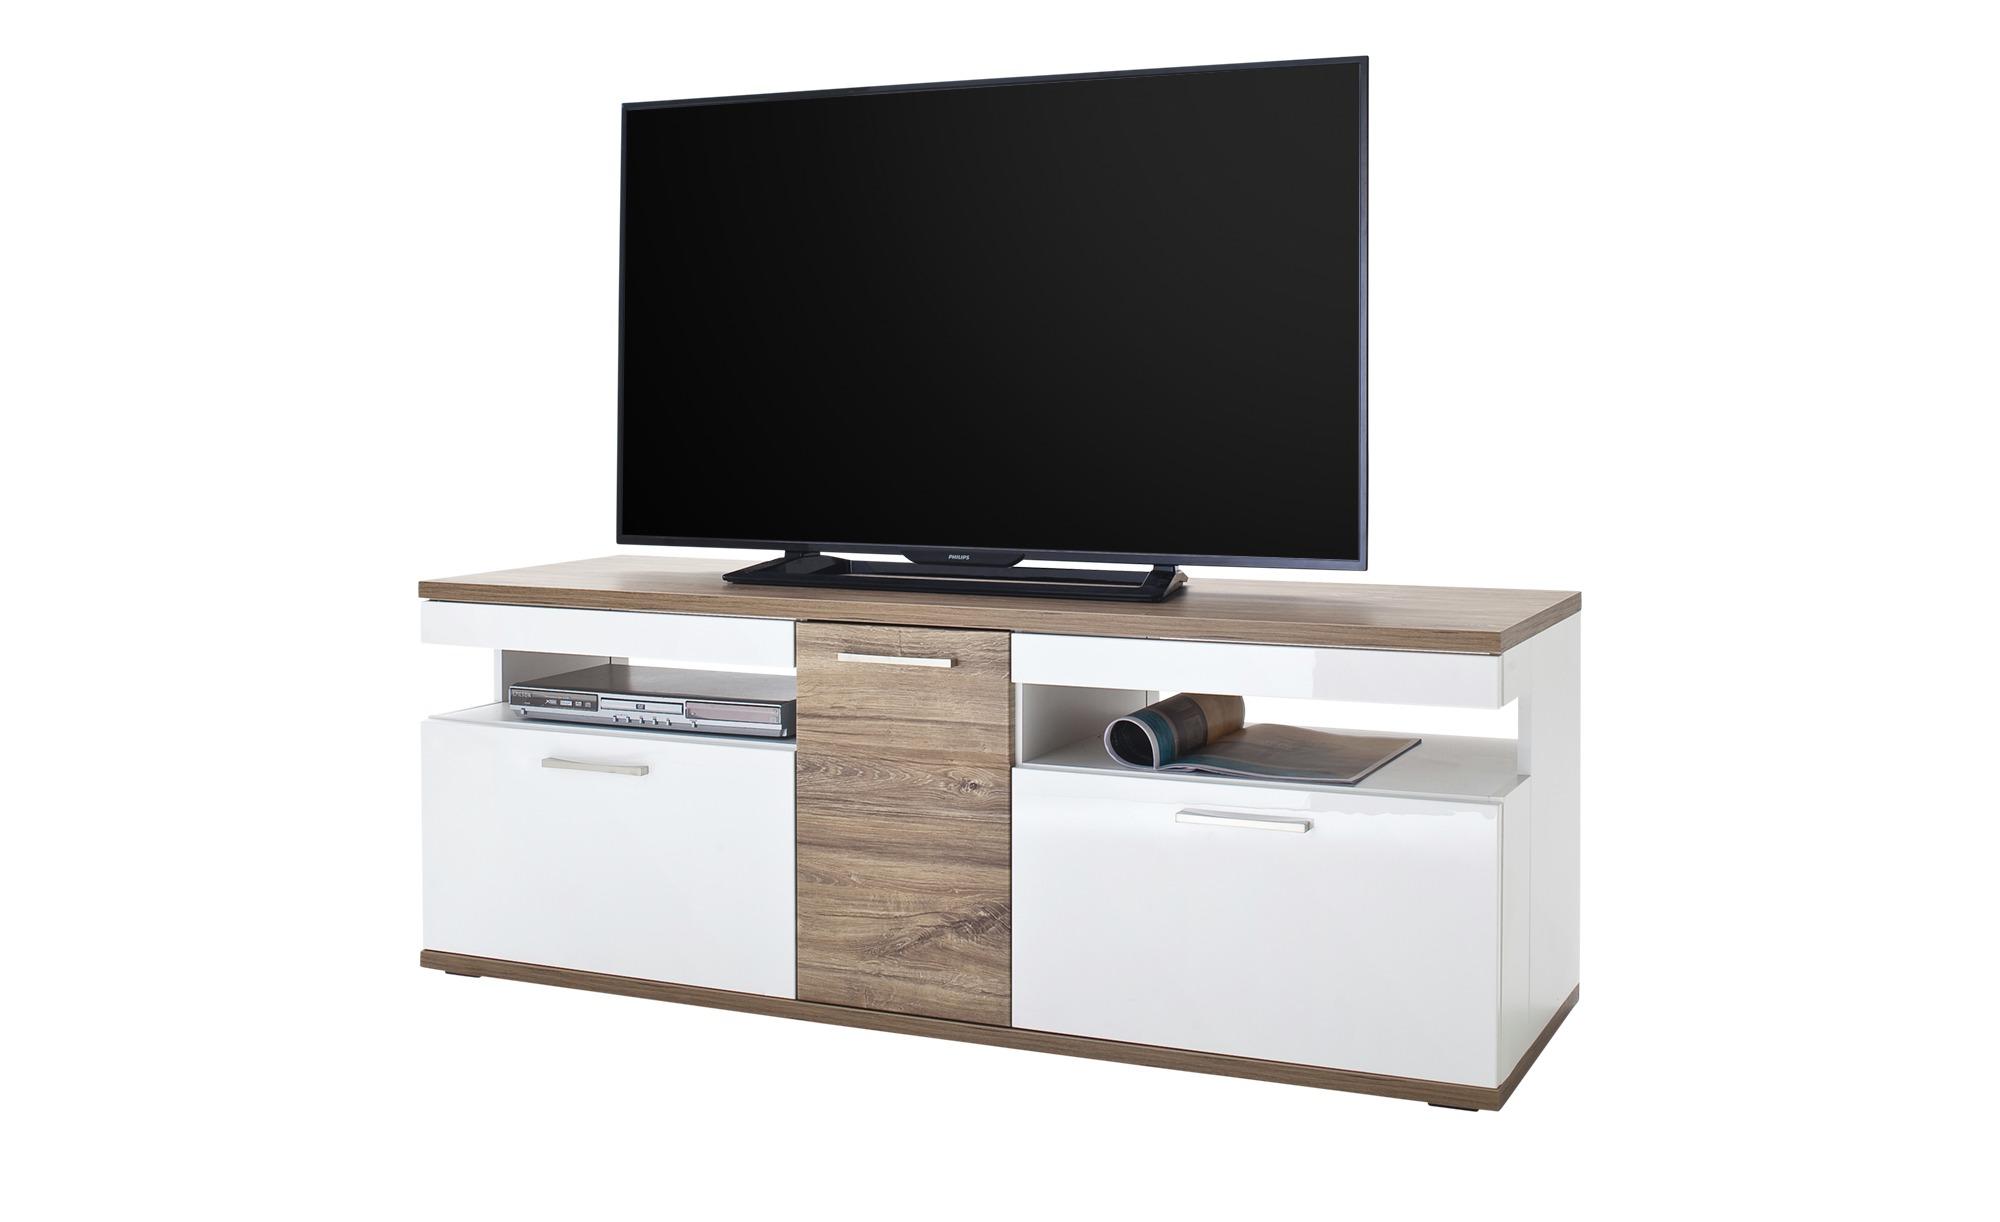 uno TV-Lowboard  Zypern ¦ weiß TV- & Media Möbel > TV-Racks - Höffner günstig online kaufen